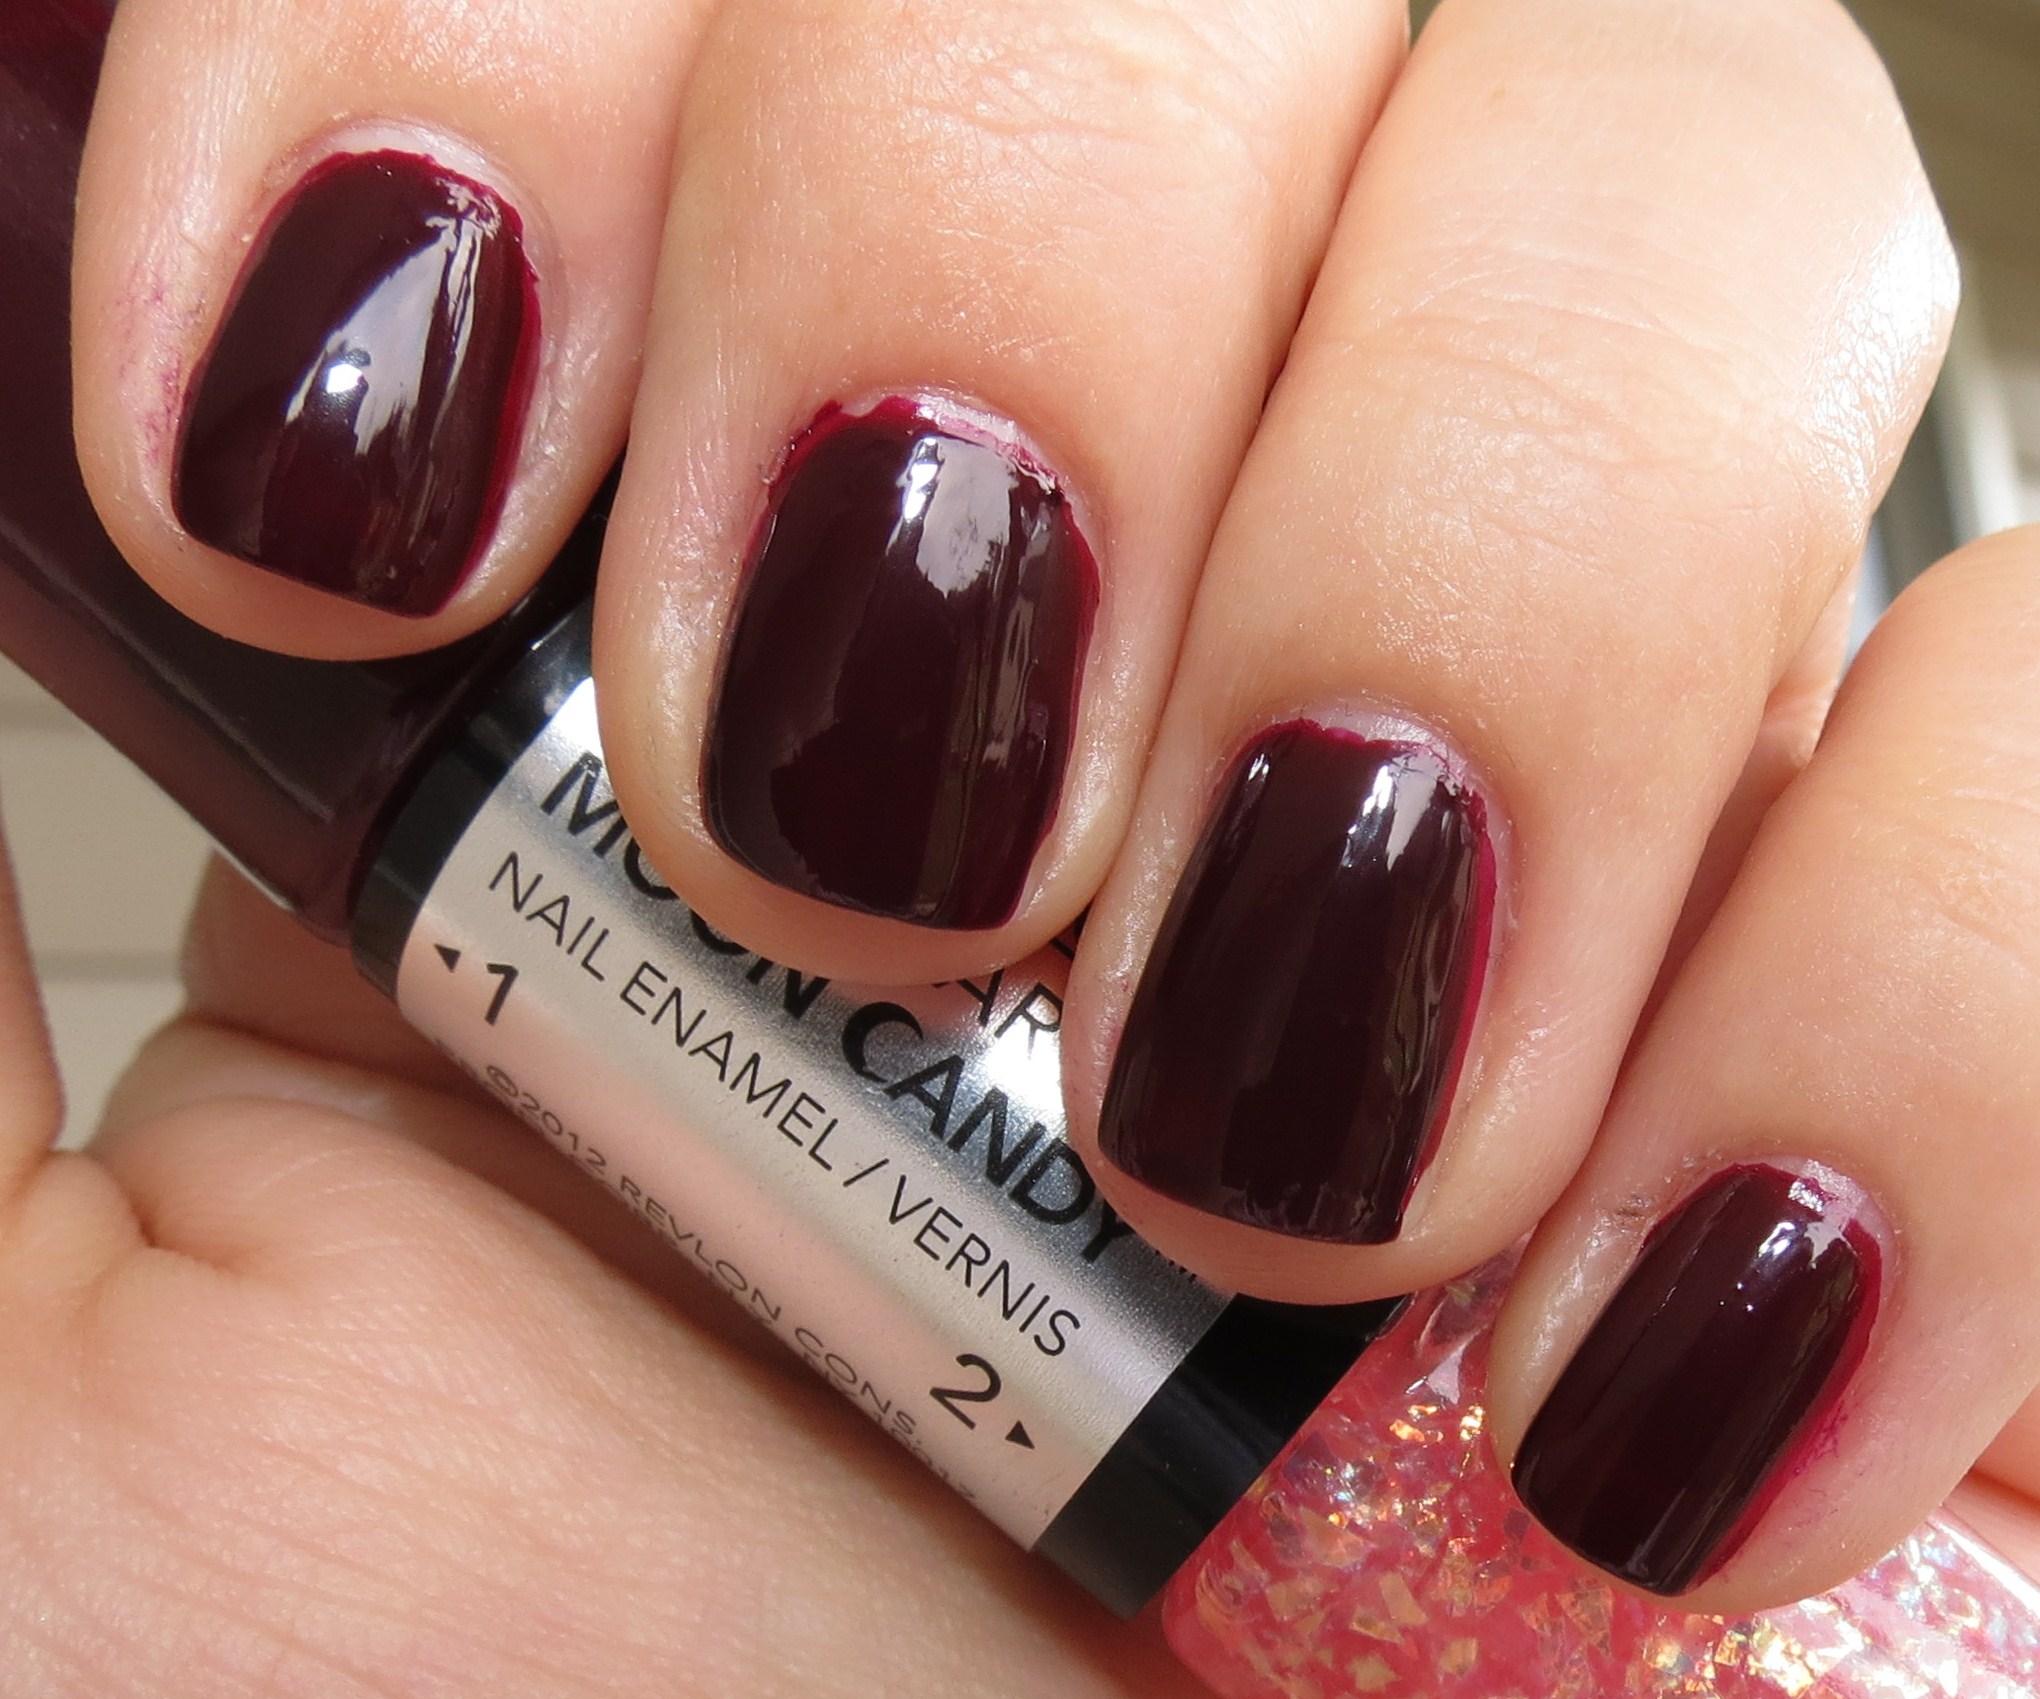 Revlon Satellite Nail Art Moon Candy Nail Enamel Swatches Amp Review Blushing Noir